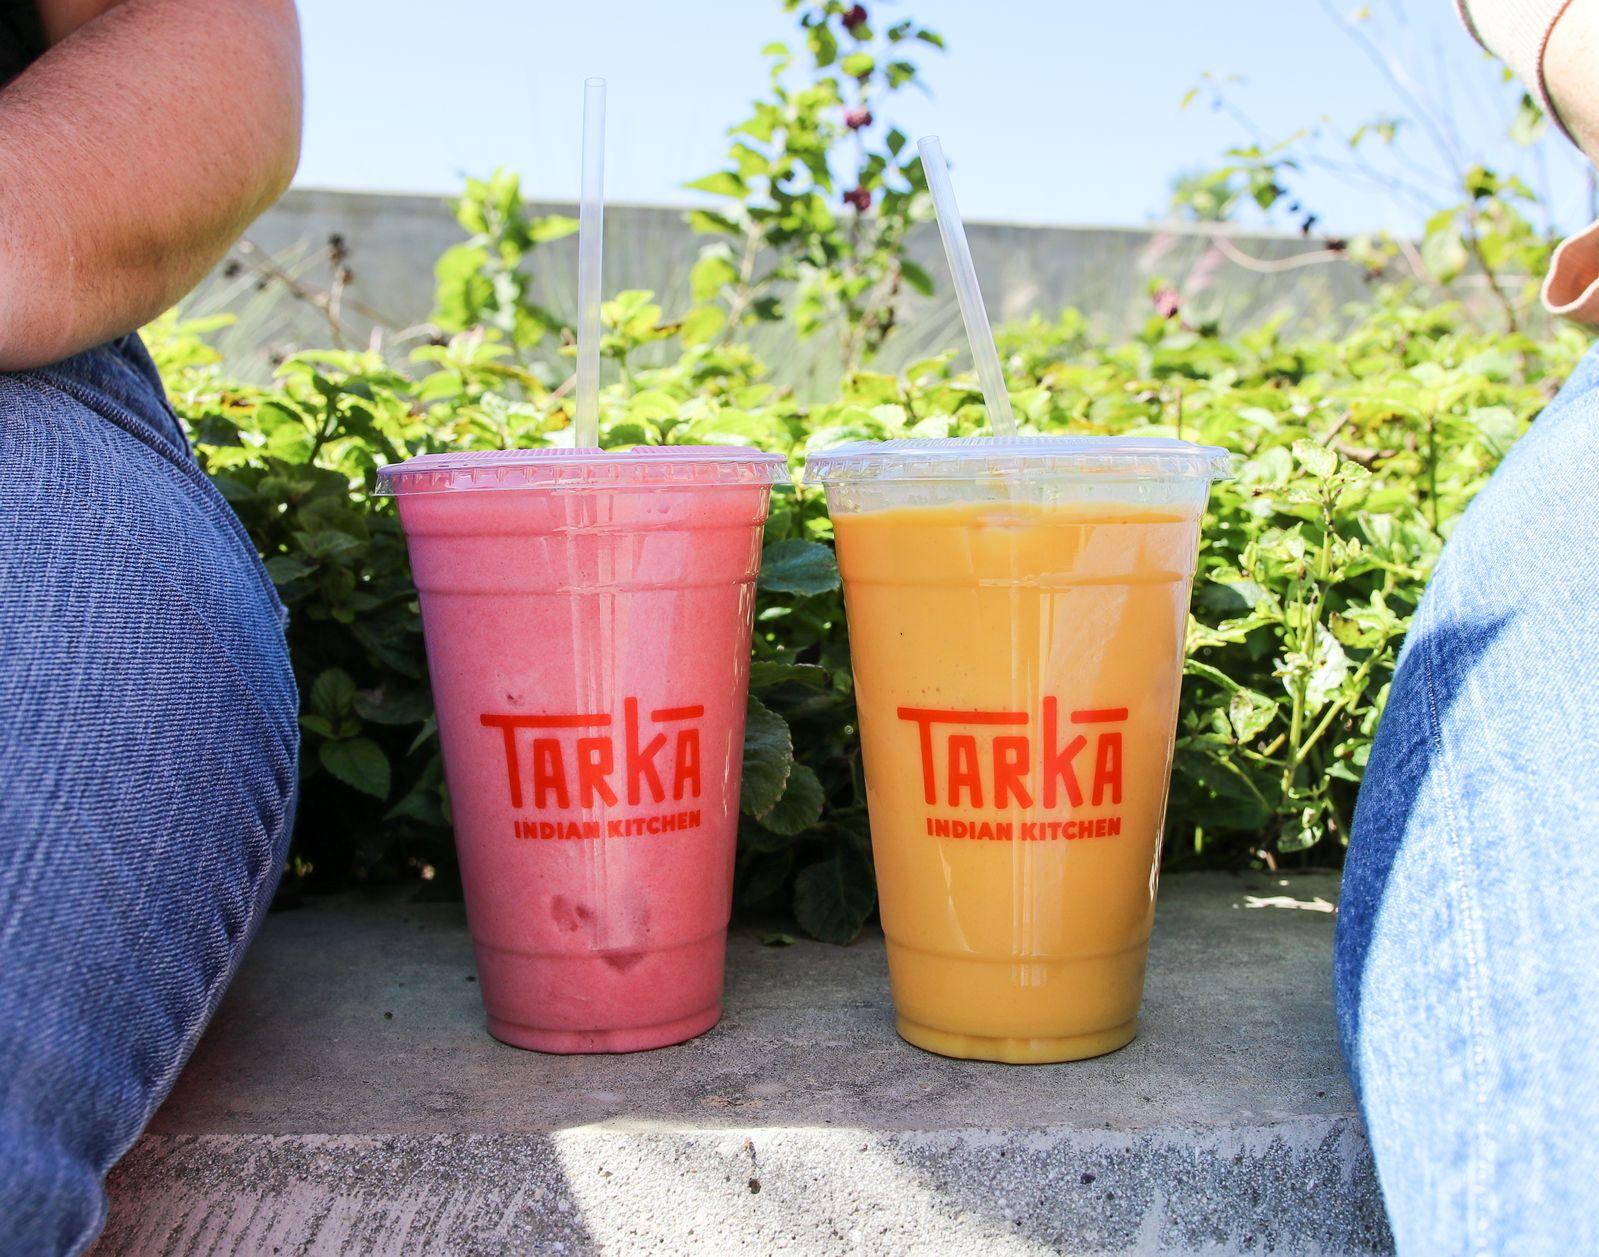 Tarka Indian Kitchen Debuts New Vegan and Vegetarian Items